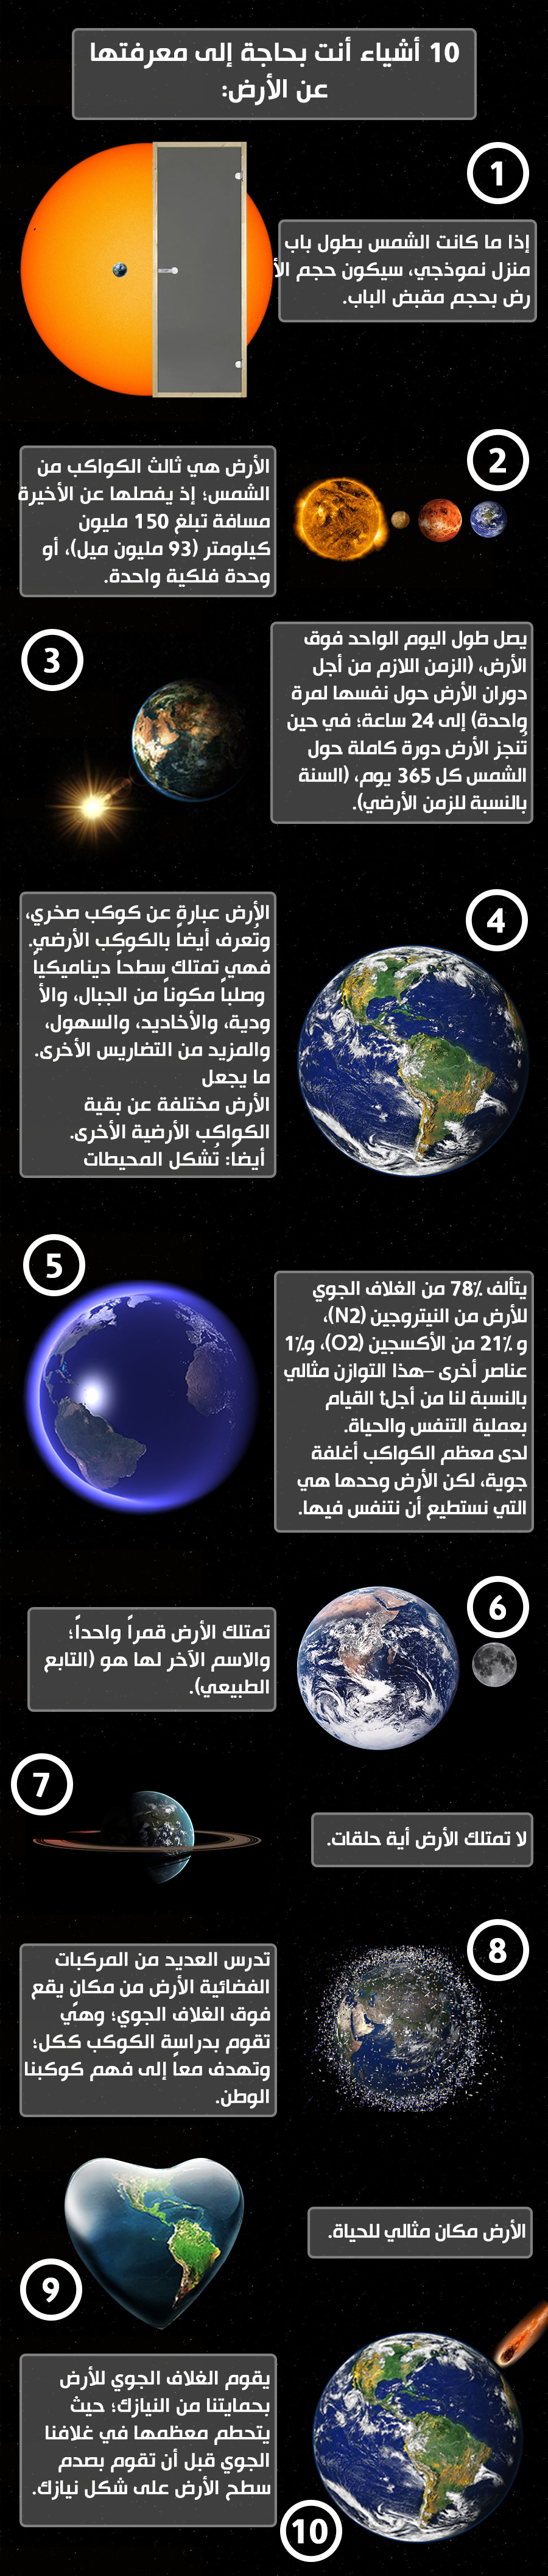 10 ﺃﺷﻴﺎﺀ ﺃﻧﺖ ﺑﺤﺎﺟﺔ ﺇﻟﻰ ﻣﻌﺮﻓﺘﻬﺎ ﻋﻦ ﺍﻷ ﺭﺽ تصميم عدنان الناصيري للمزيد Https Www Facebook Com Nasainarabic Science And Nature Infographic Astronomy